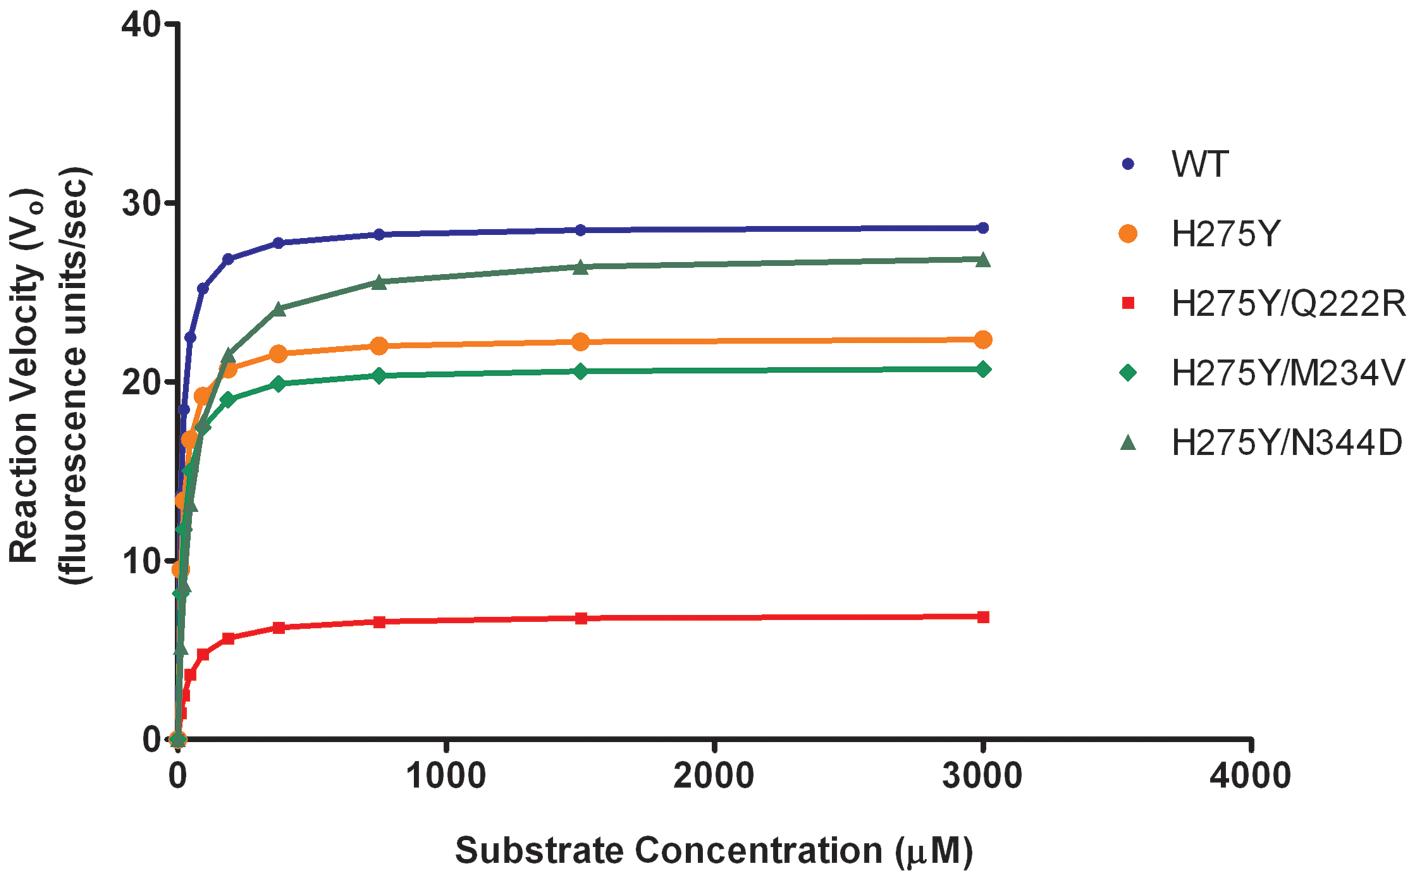 Neuraminidase (NA) enzyme kinetics of recombinant A/Brisbane/59/2007-like (H1N1) viruses.